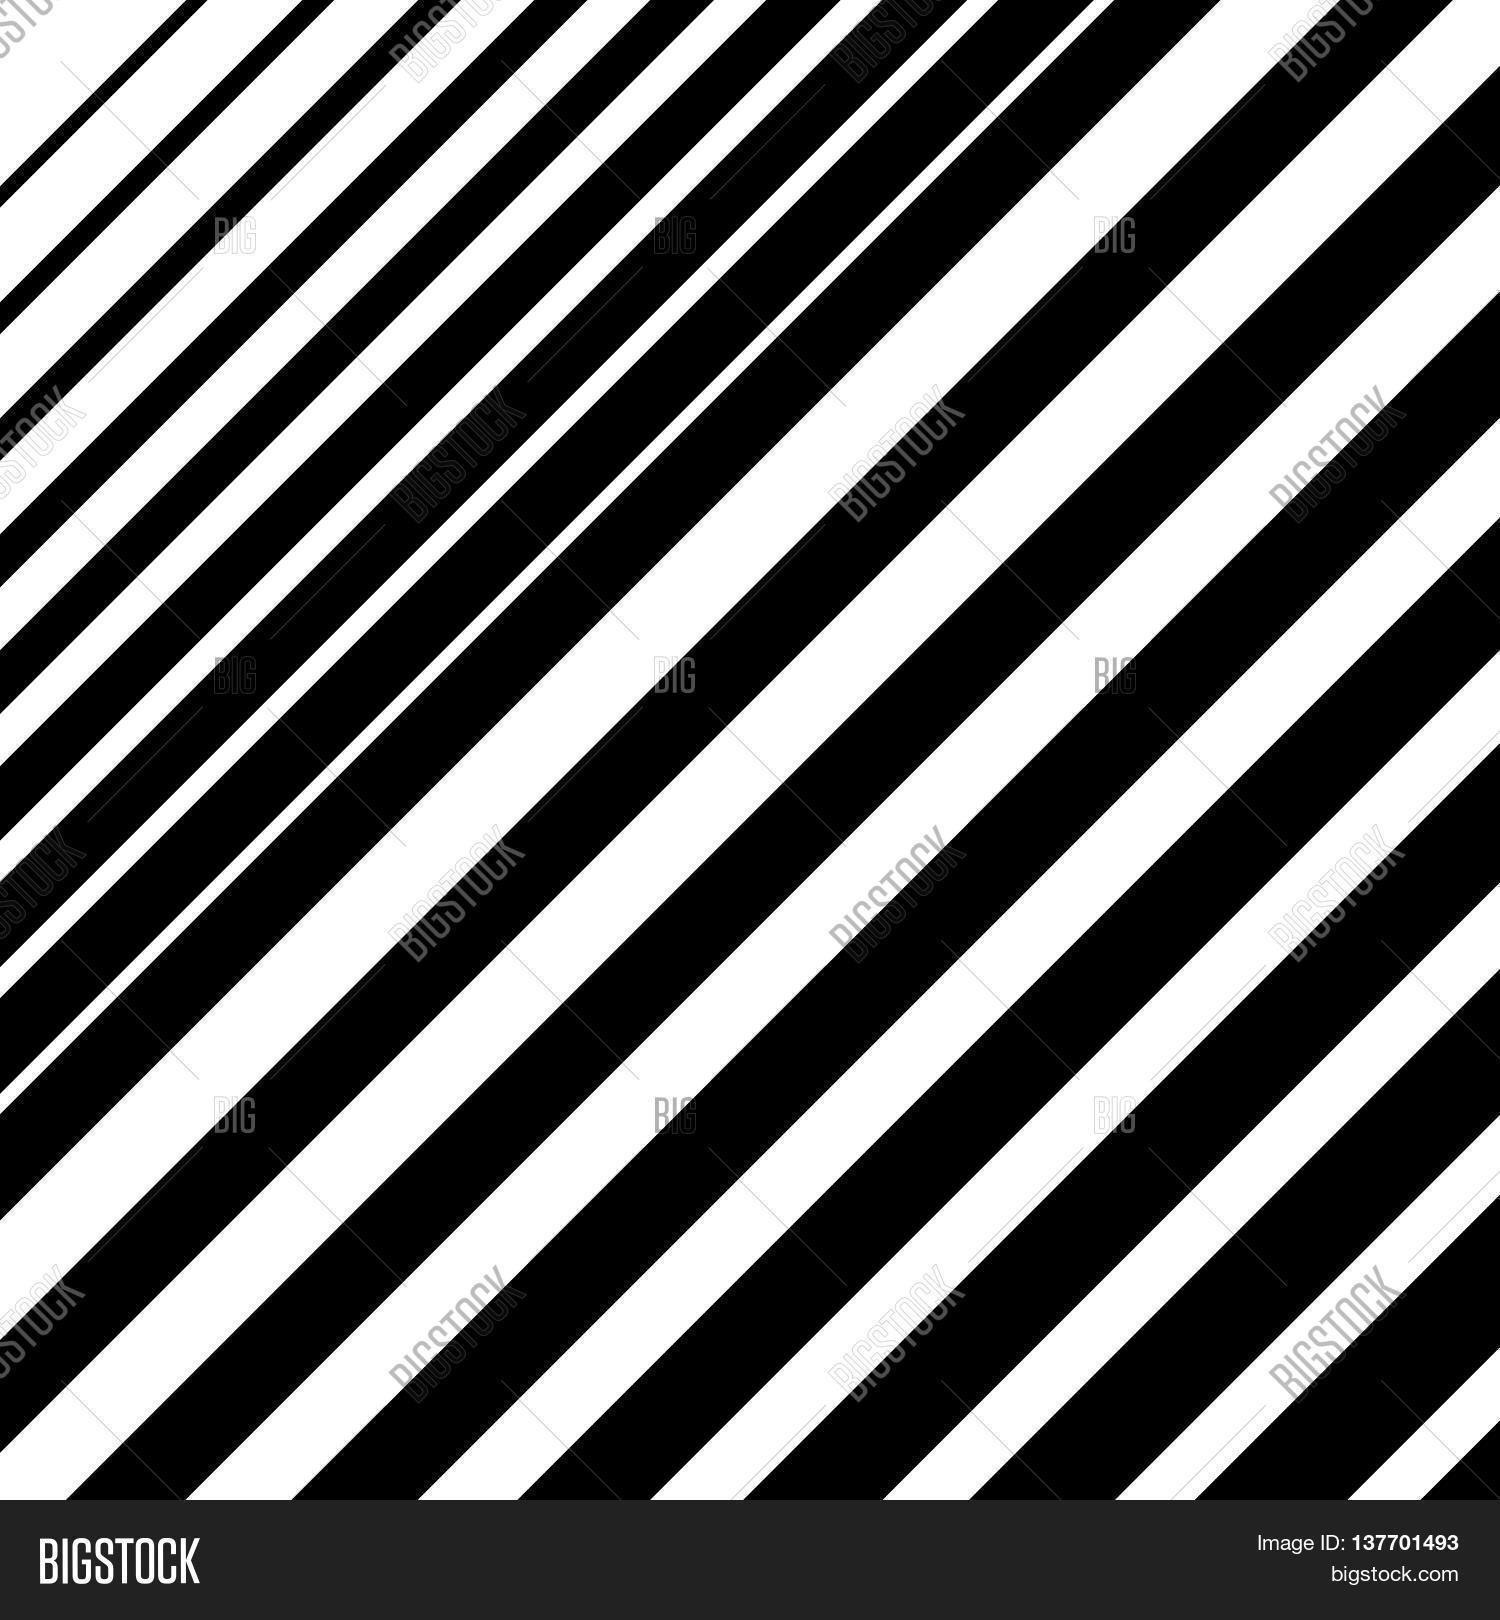 Diagonal Line Design : Dynamic diagonal lines pattern vector photo bigstock